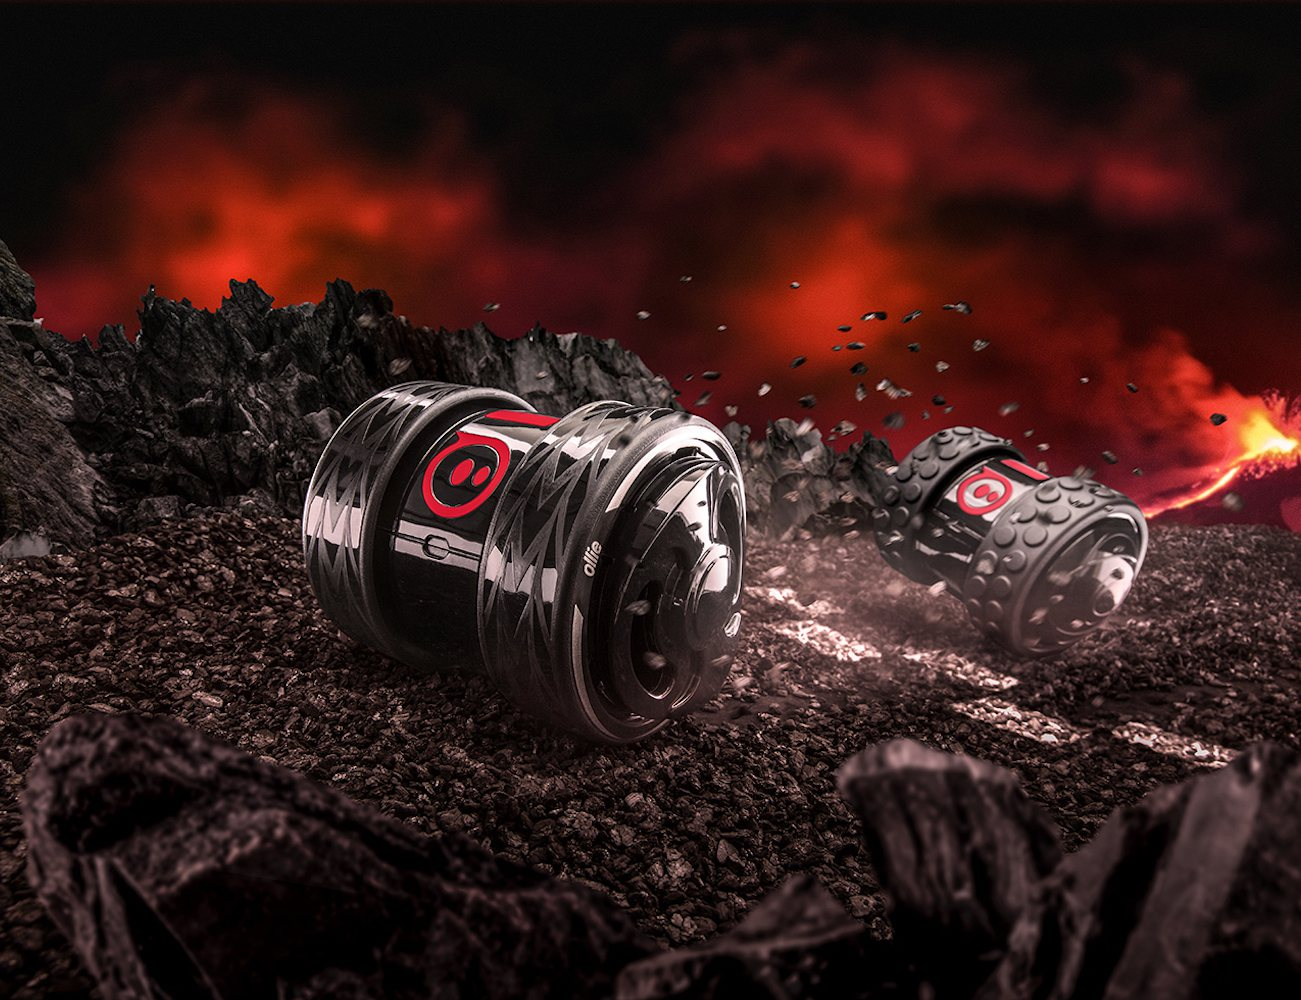 Darkside Ollie by Sphero – Power Packed Robot For App Enabled Racing